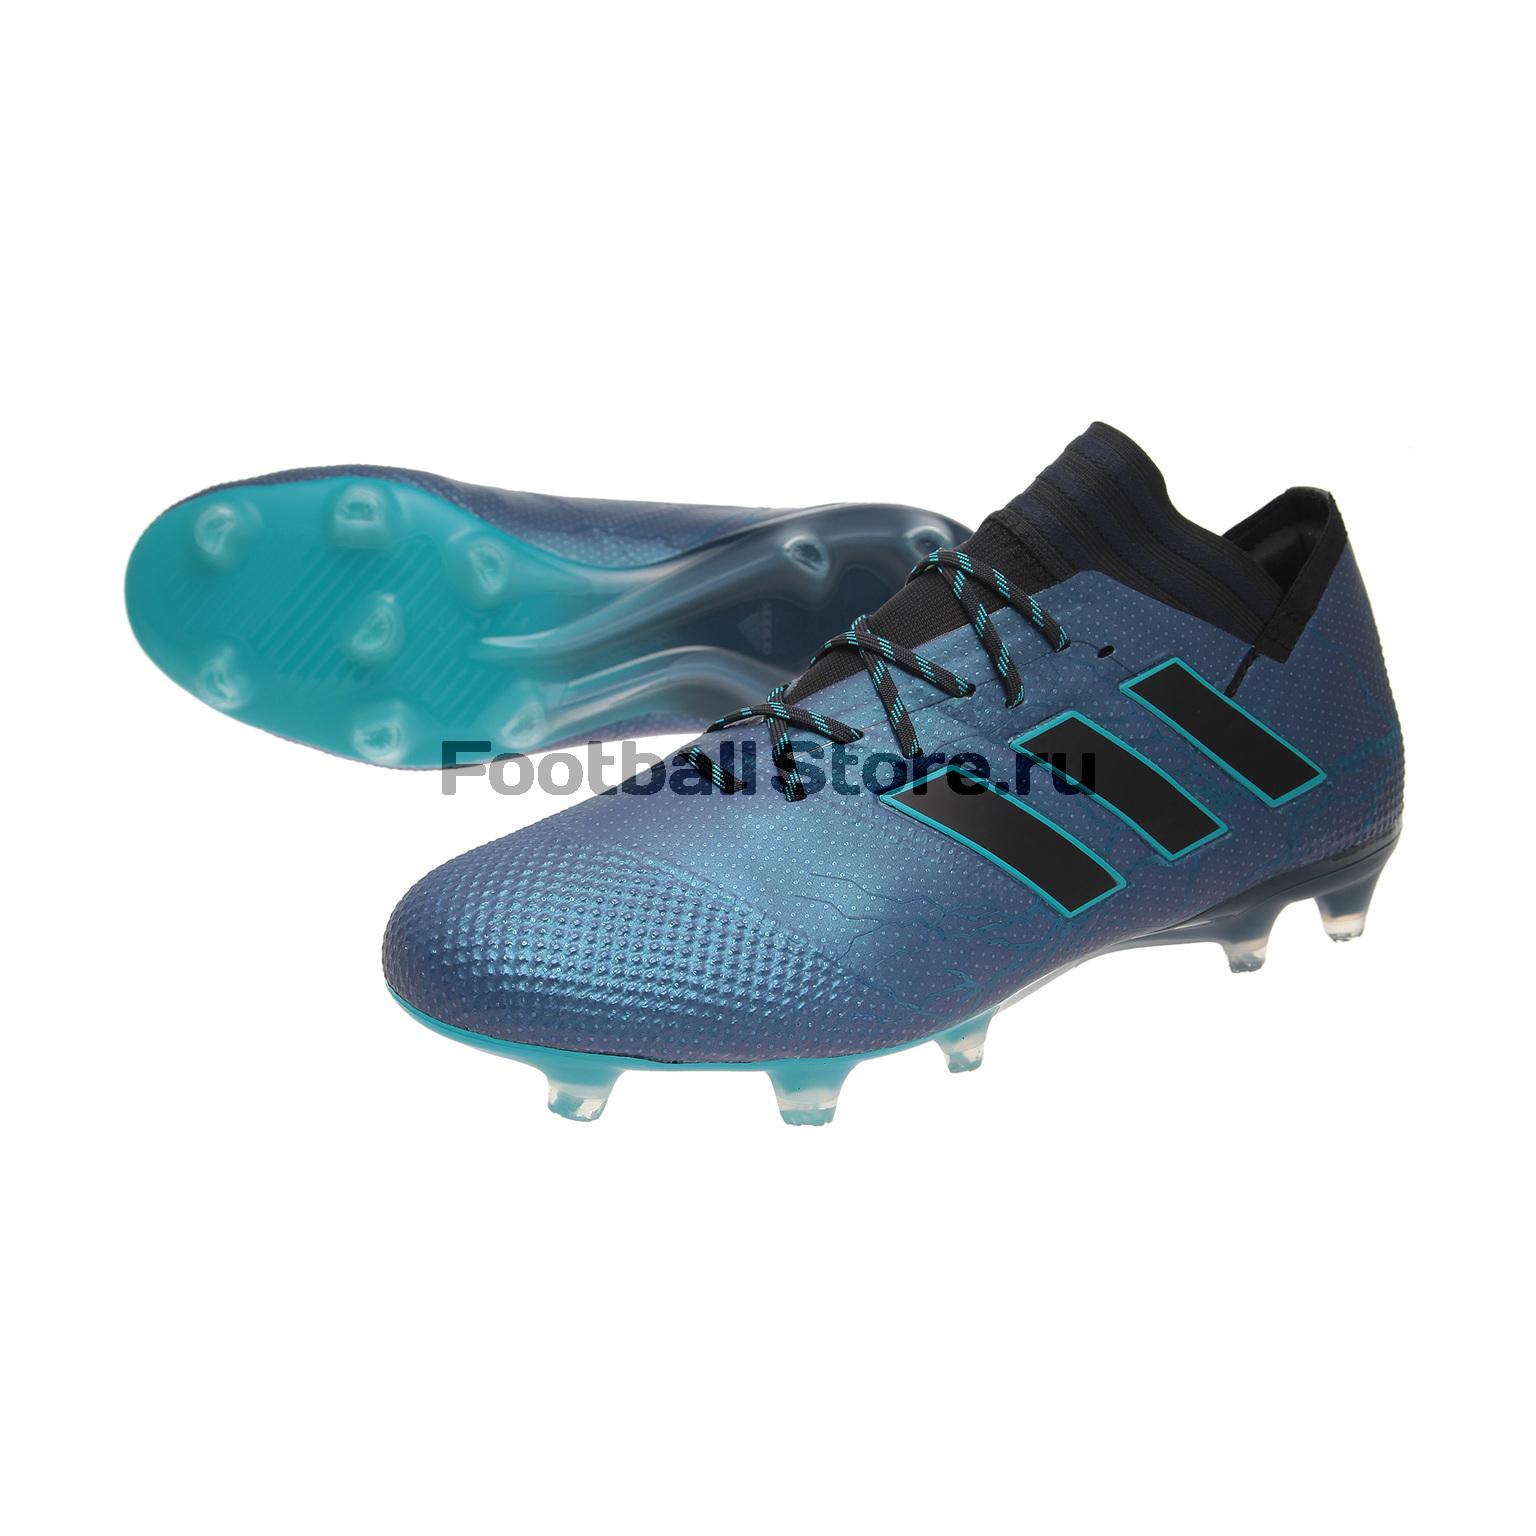 Бутсы Adidas Nemeziz 17.1 FG BB6080 детские бутсы nike бутсы nike jr phantom 3 elite df fg ah7292 081